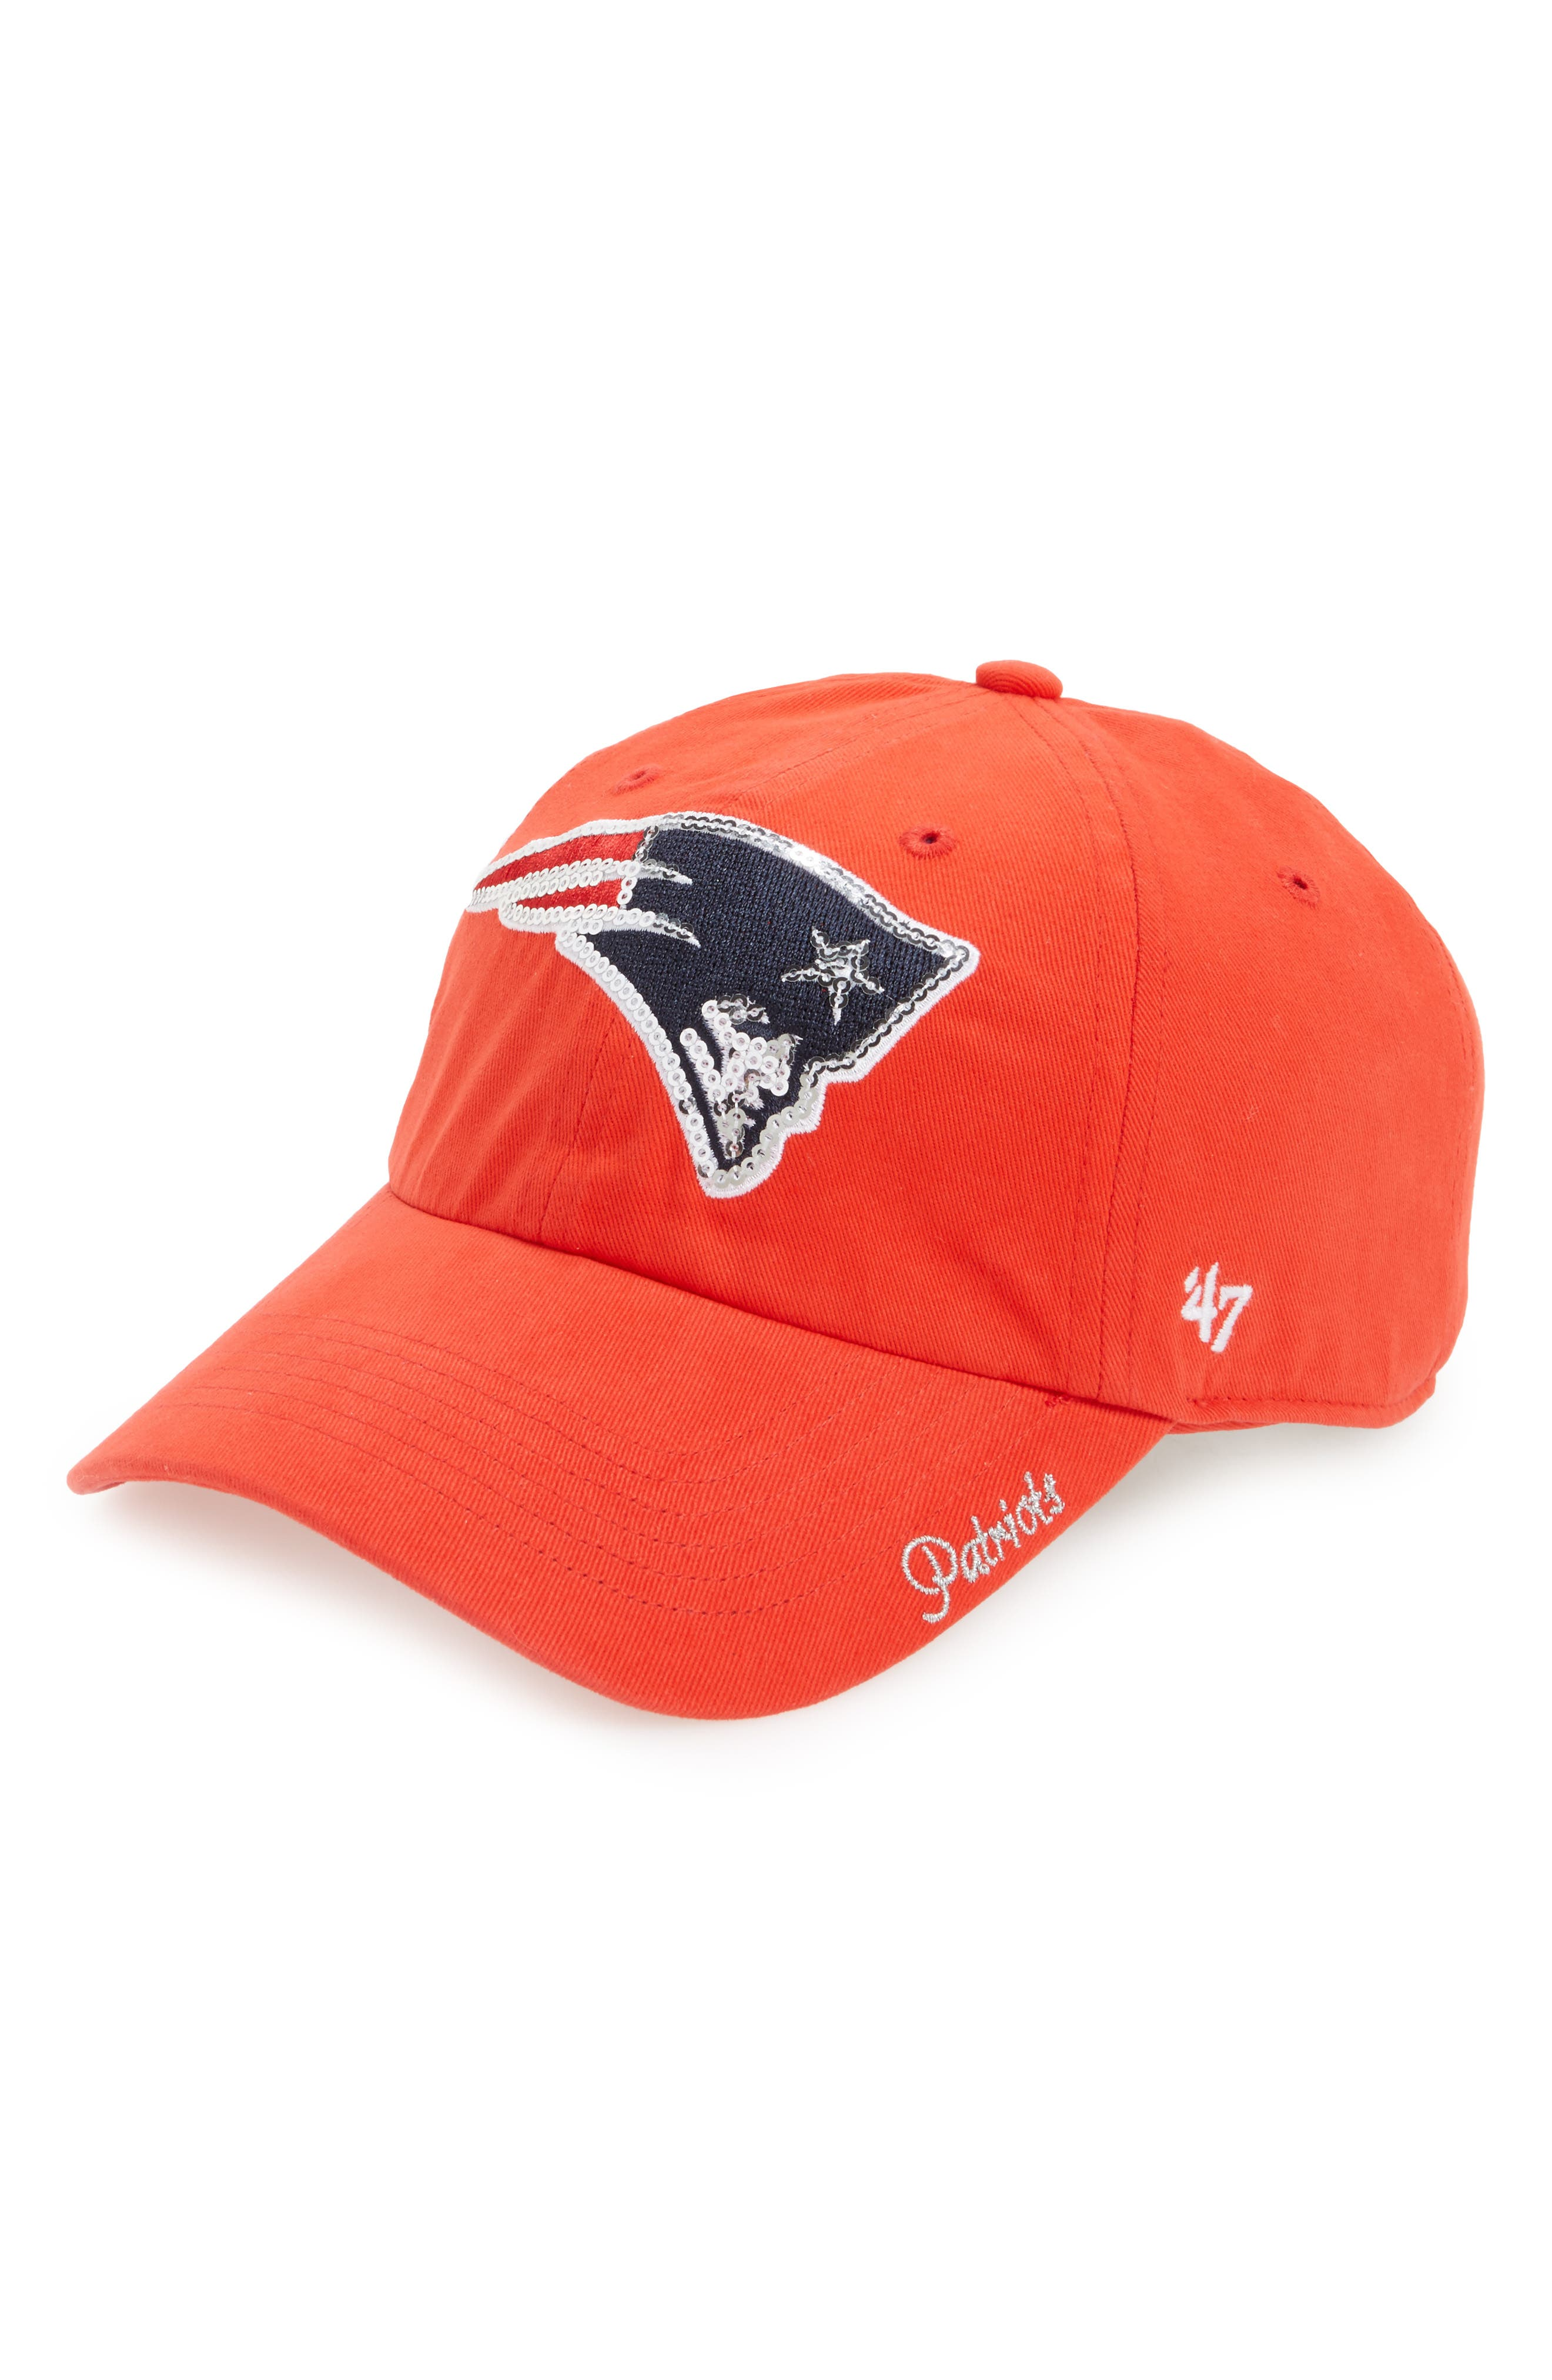 '47 New England Patriots Sparkle Cap